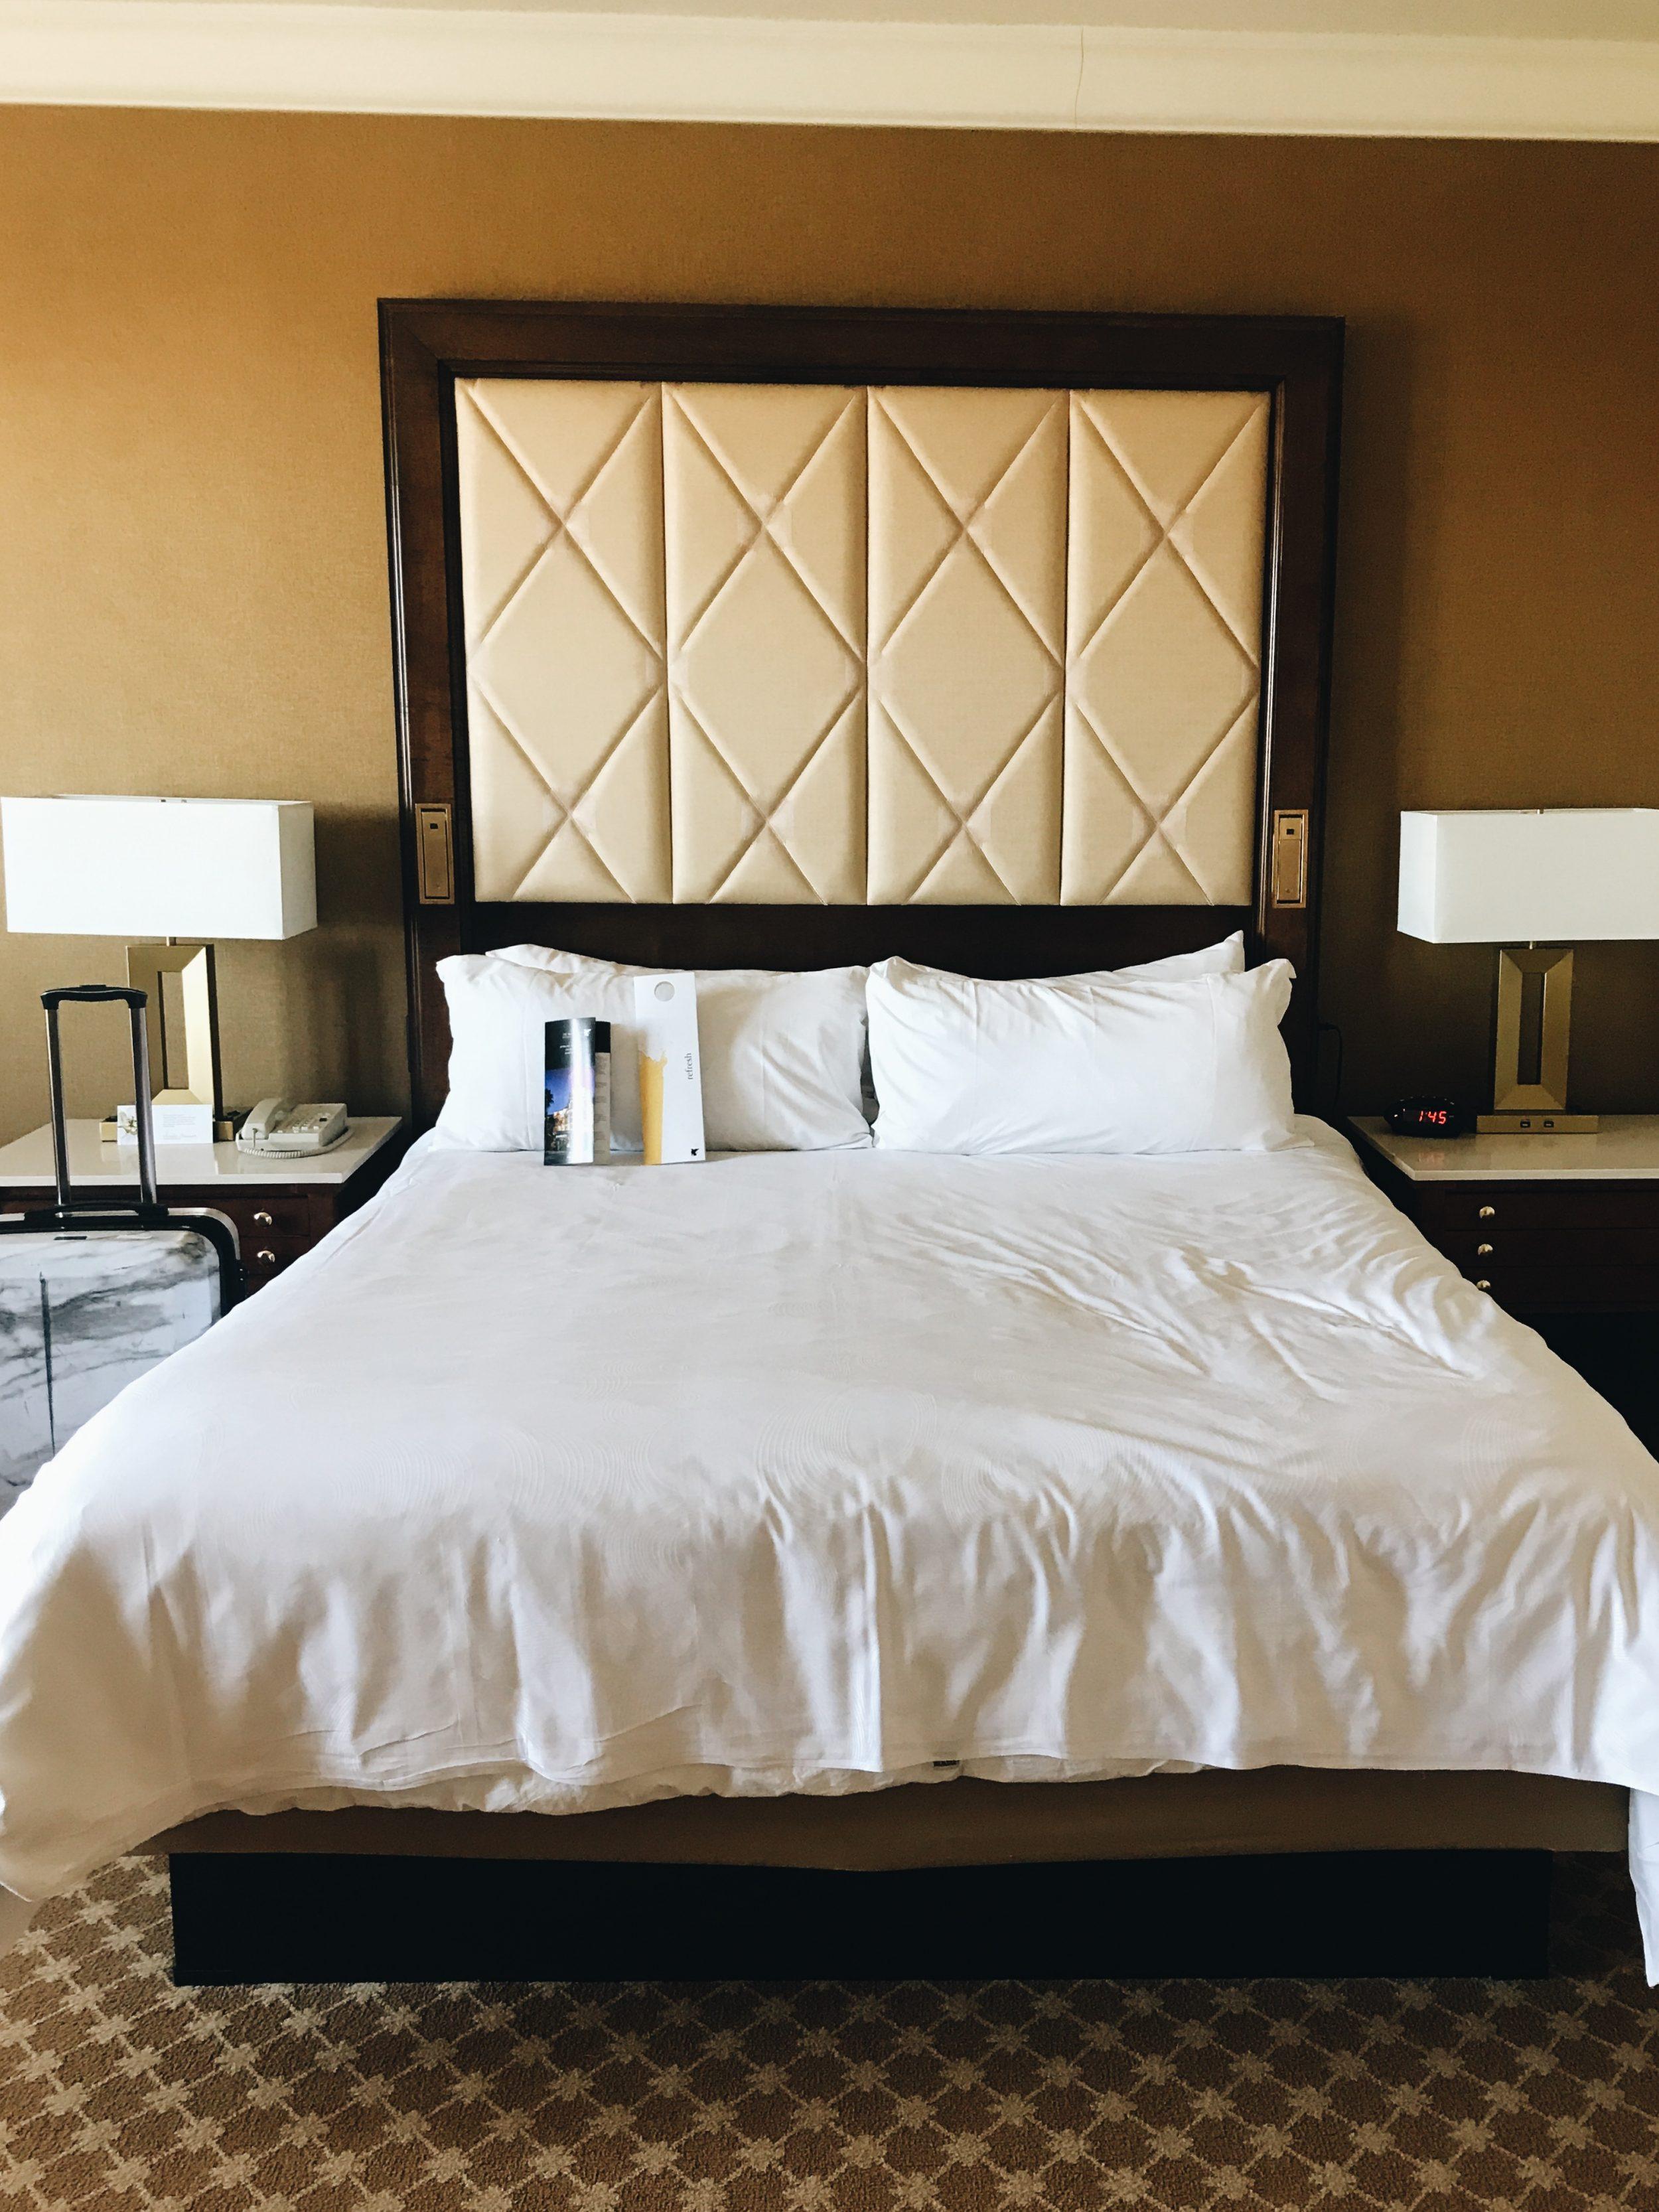 JW Marriott las vegas review